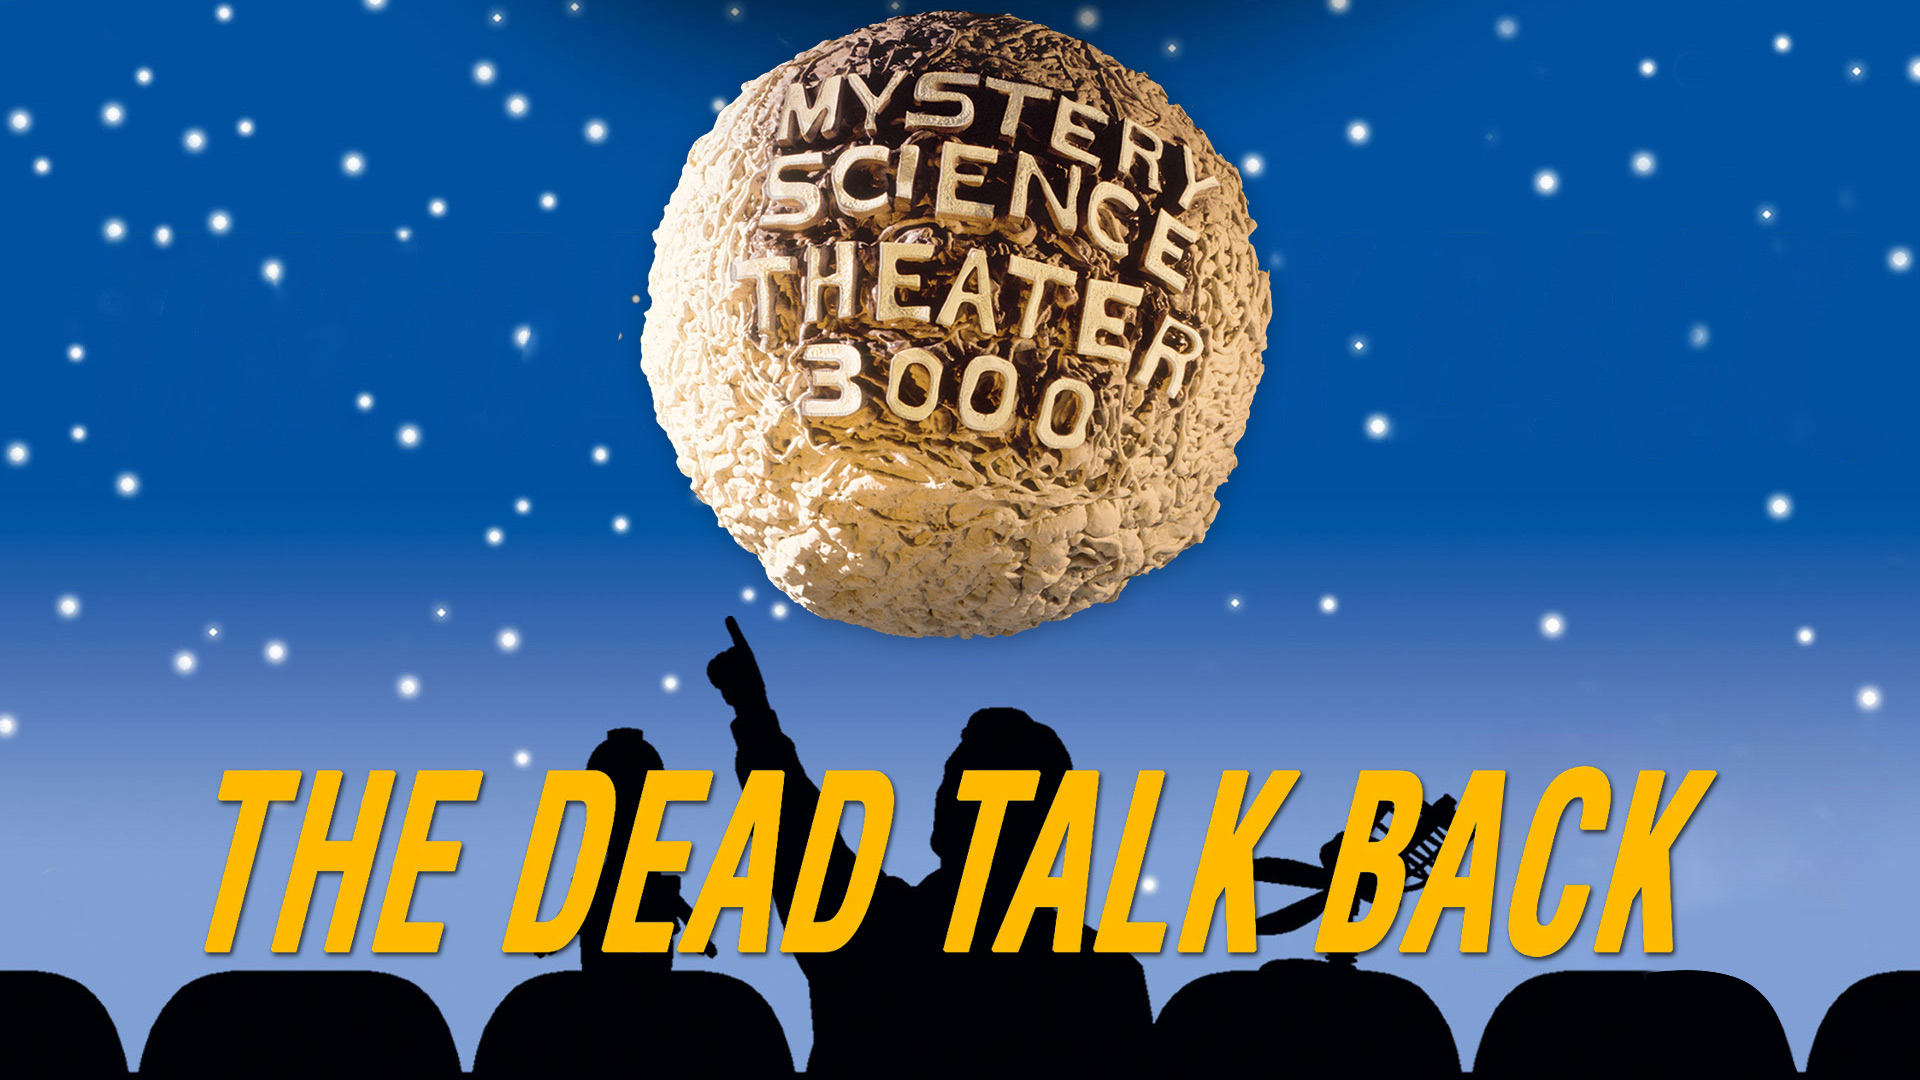 MST3K: The Dead Talk Back